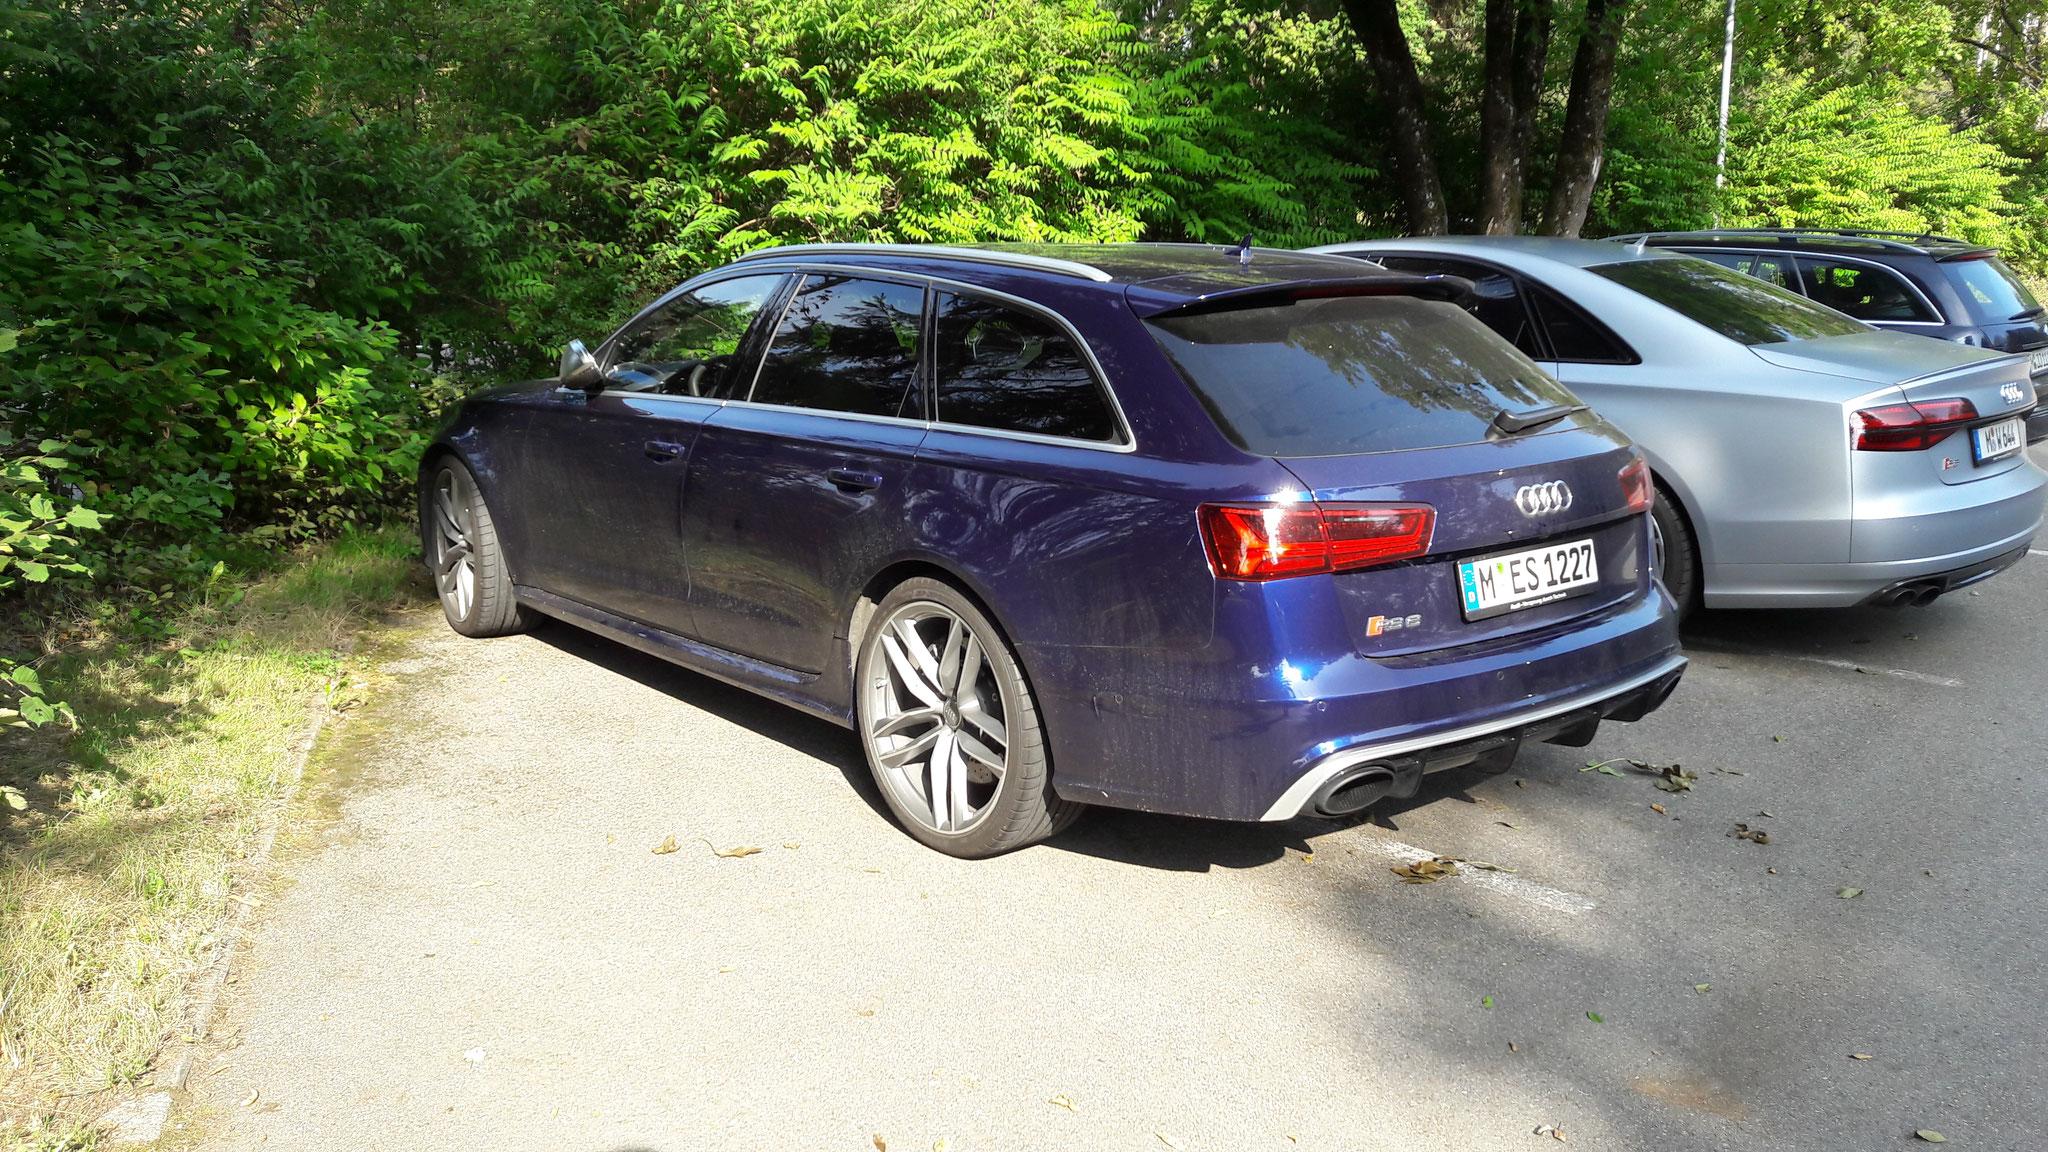 Audi RS6 - M-ES-1227